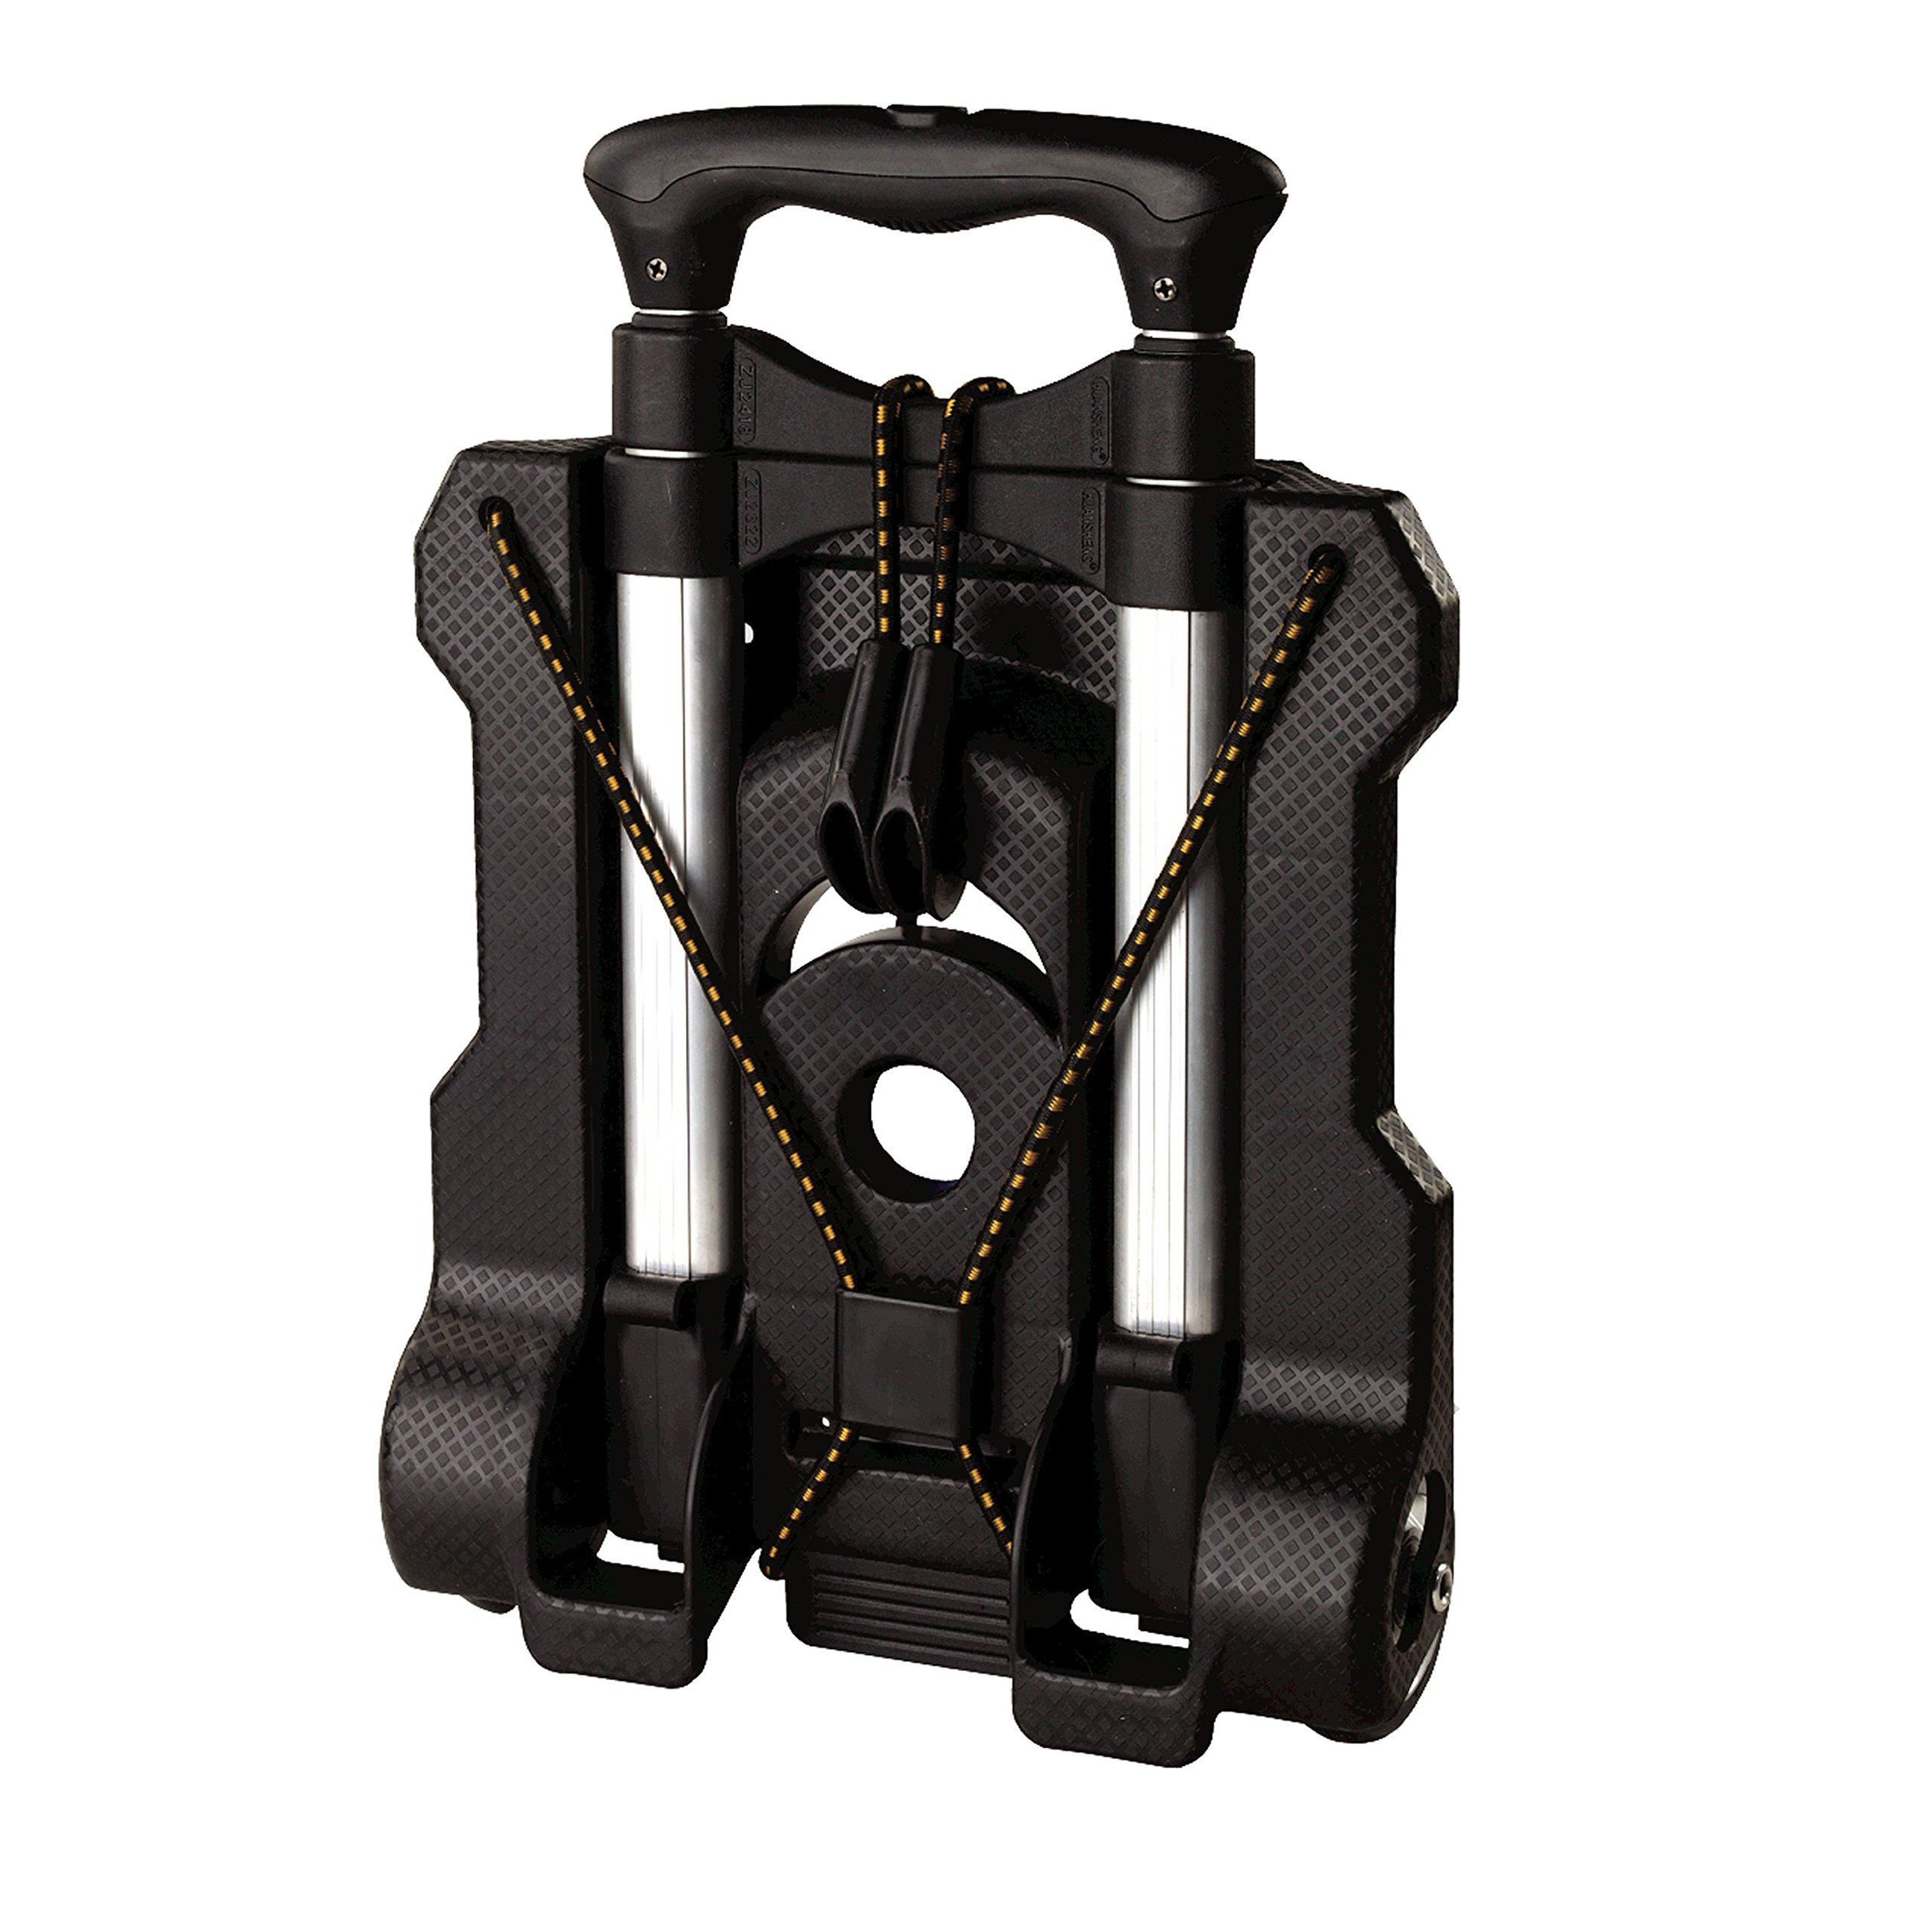 Samsonite Luggage Compact Folding Black